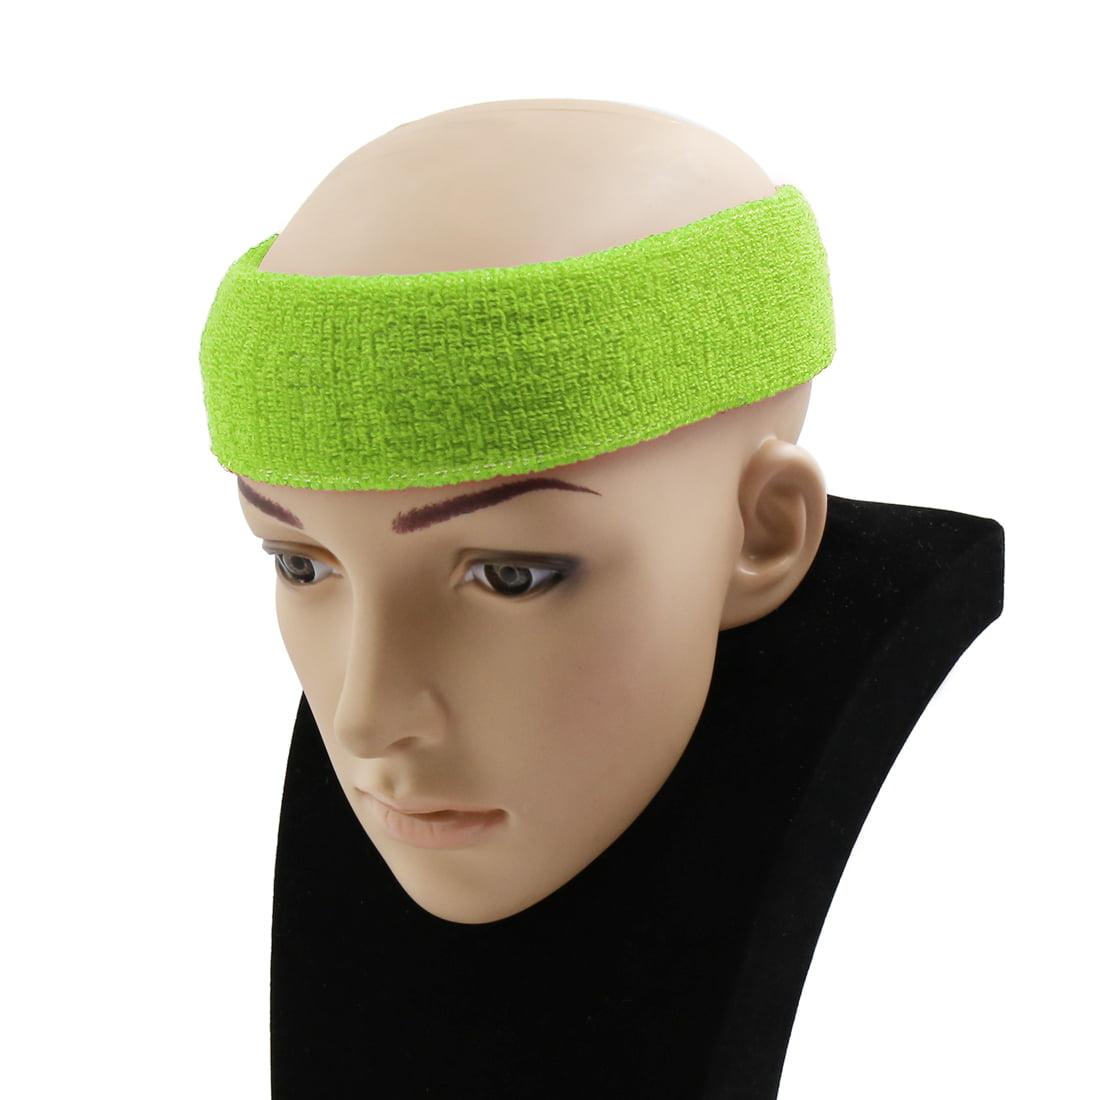 Sport Exercise Headband Sweatband Wristband Running Yoga Xfit